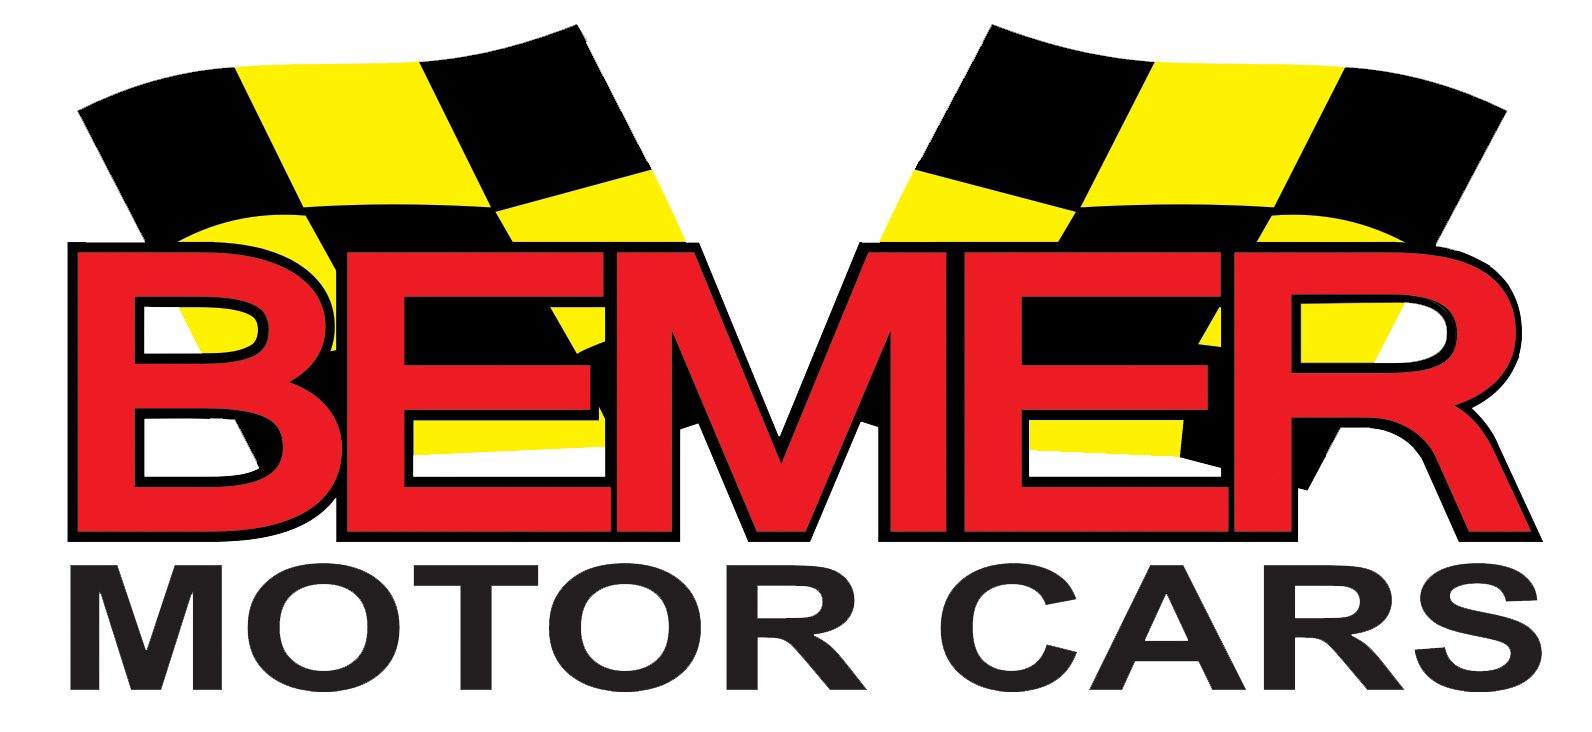 Cargurus houston maserati maserati granturismo convertible for Dean motor cars houston tx